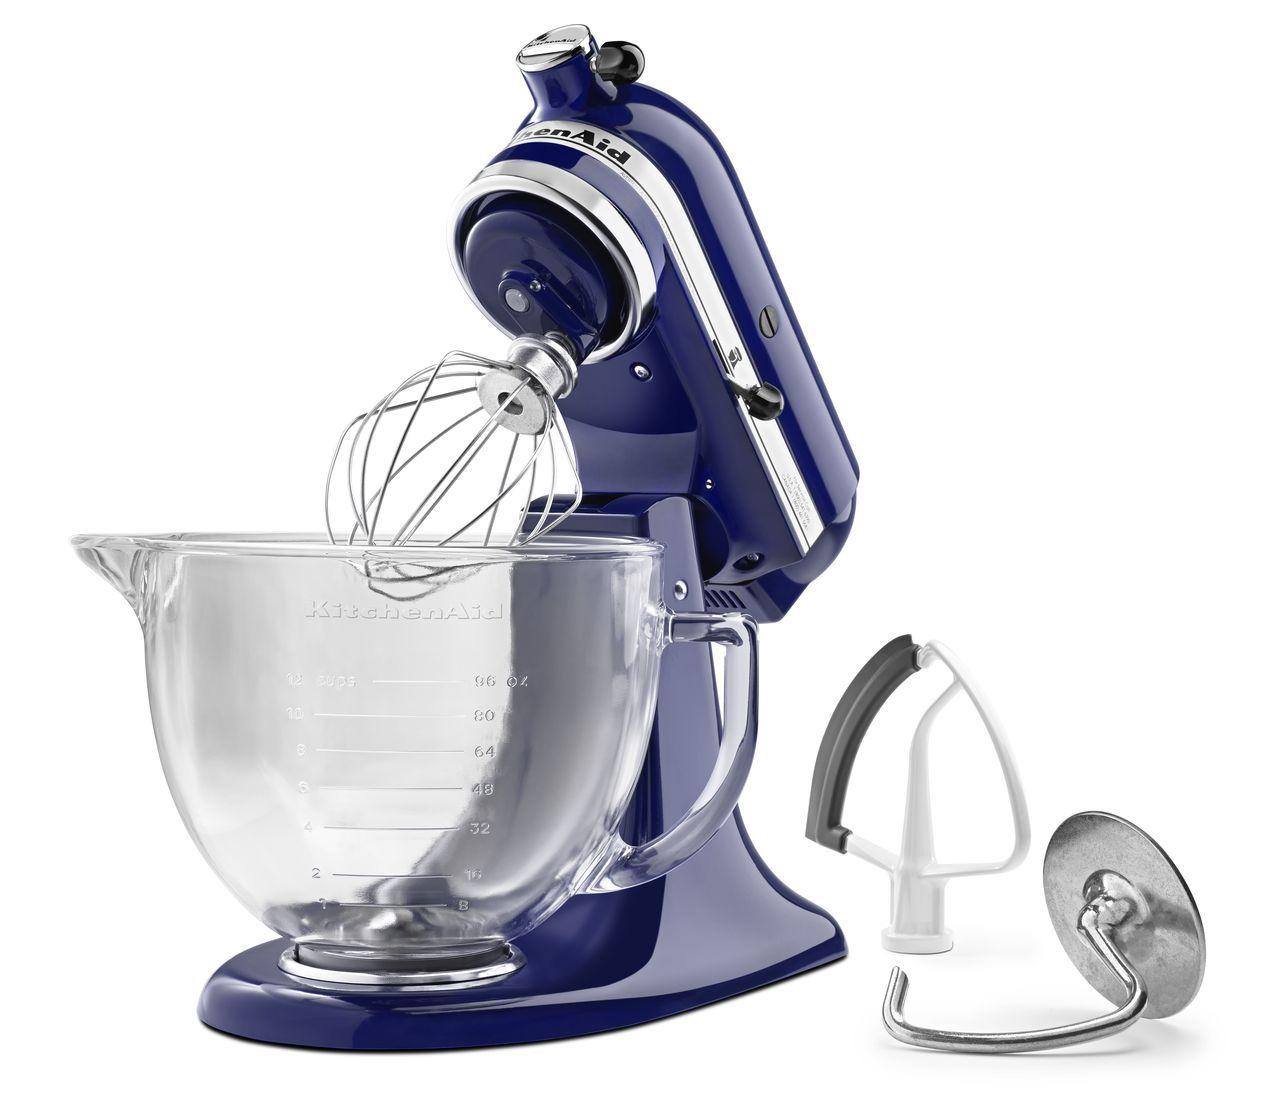 KitchenAid Artisan Series 5-Quart Tilt-Head Stand Mixer, Blue with Glass Bowl